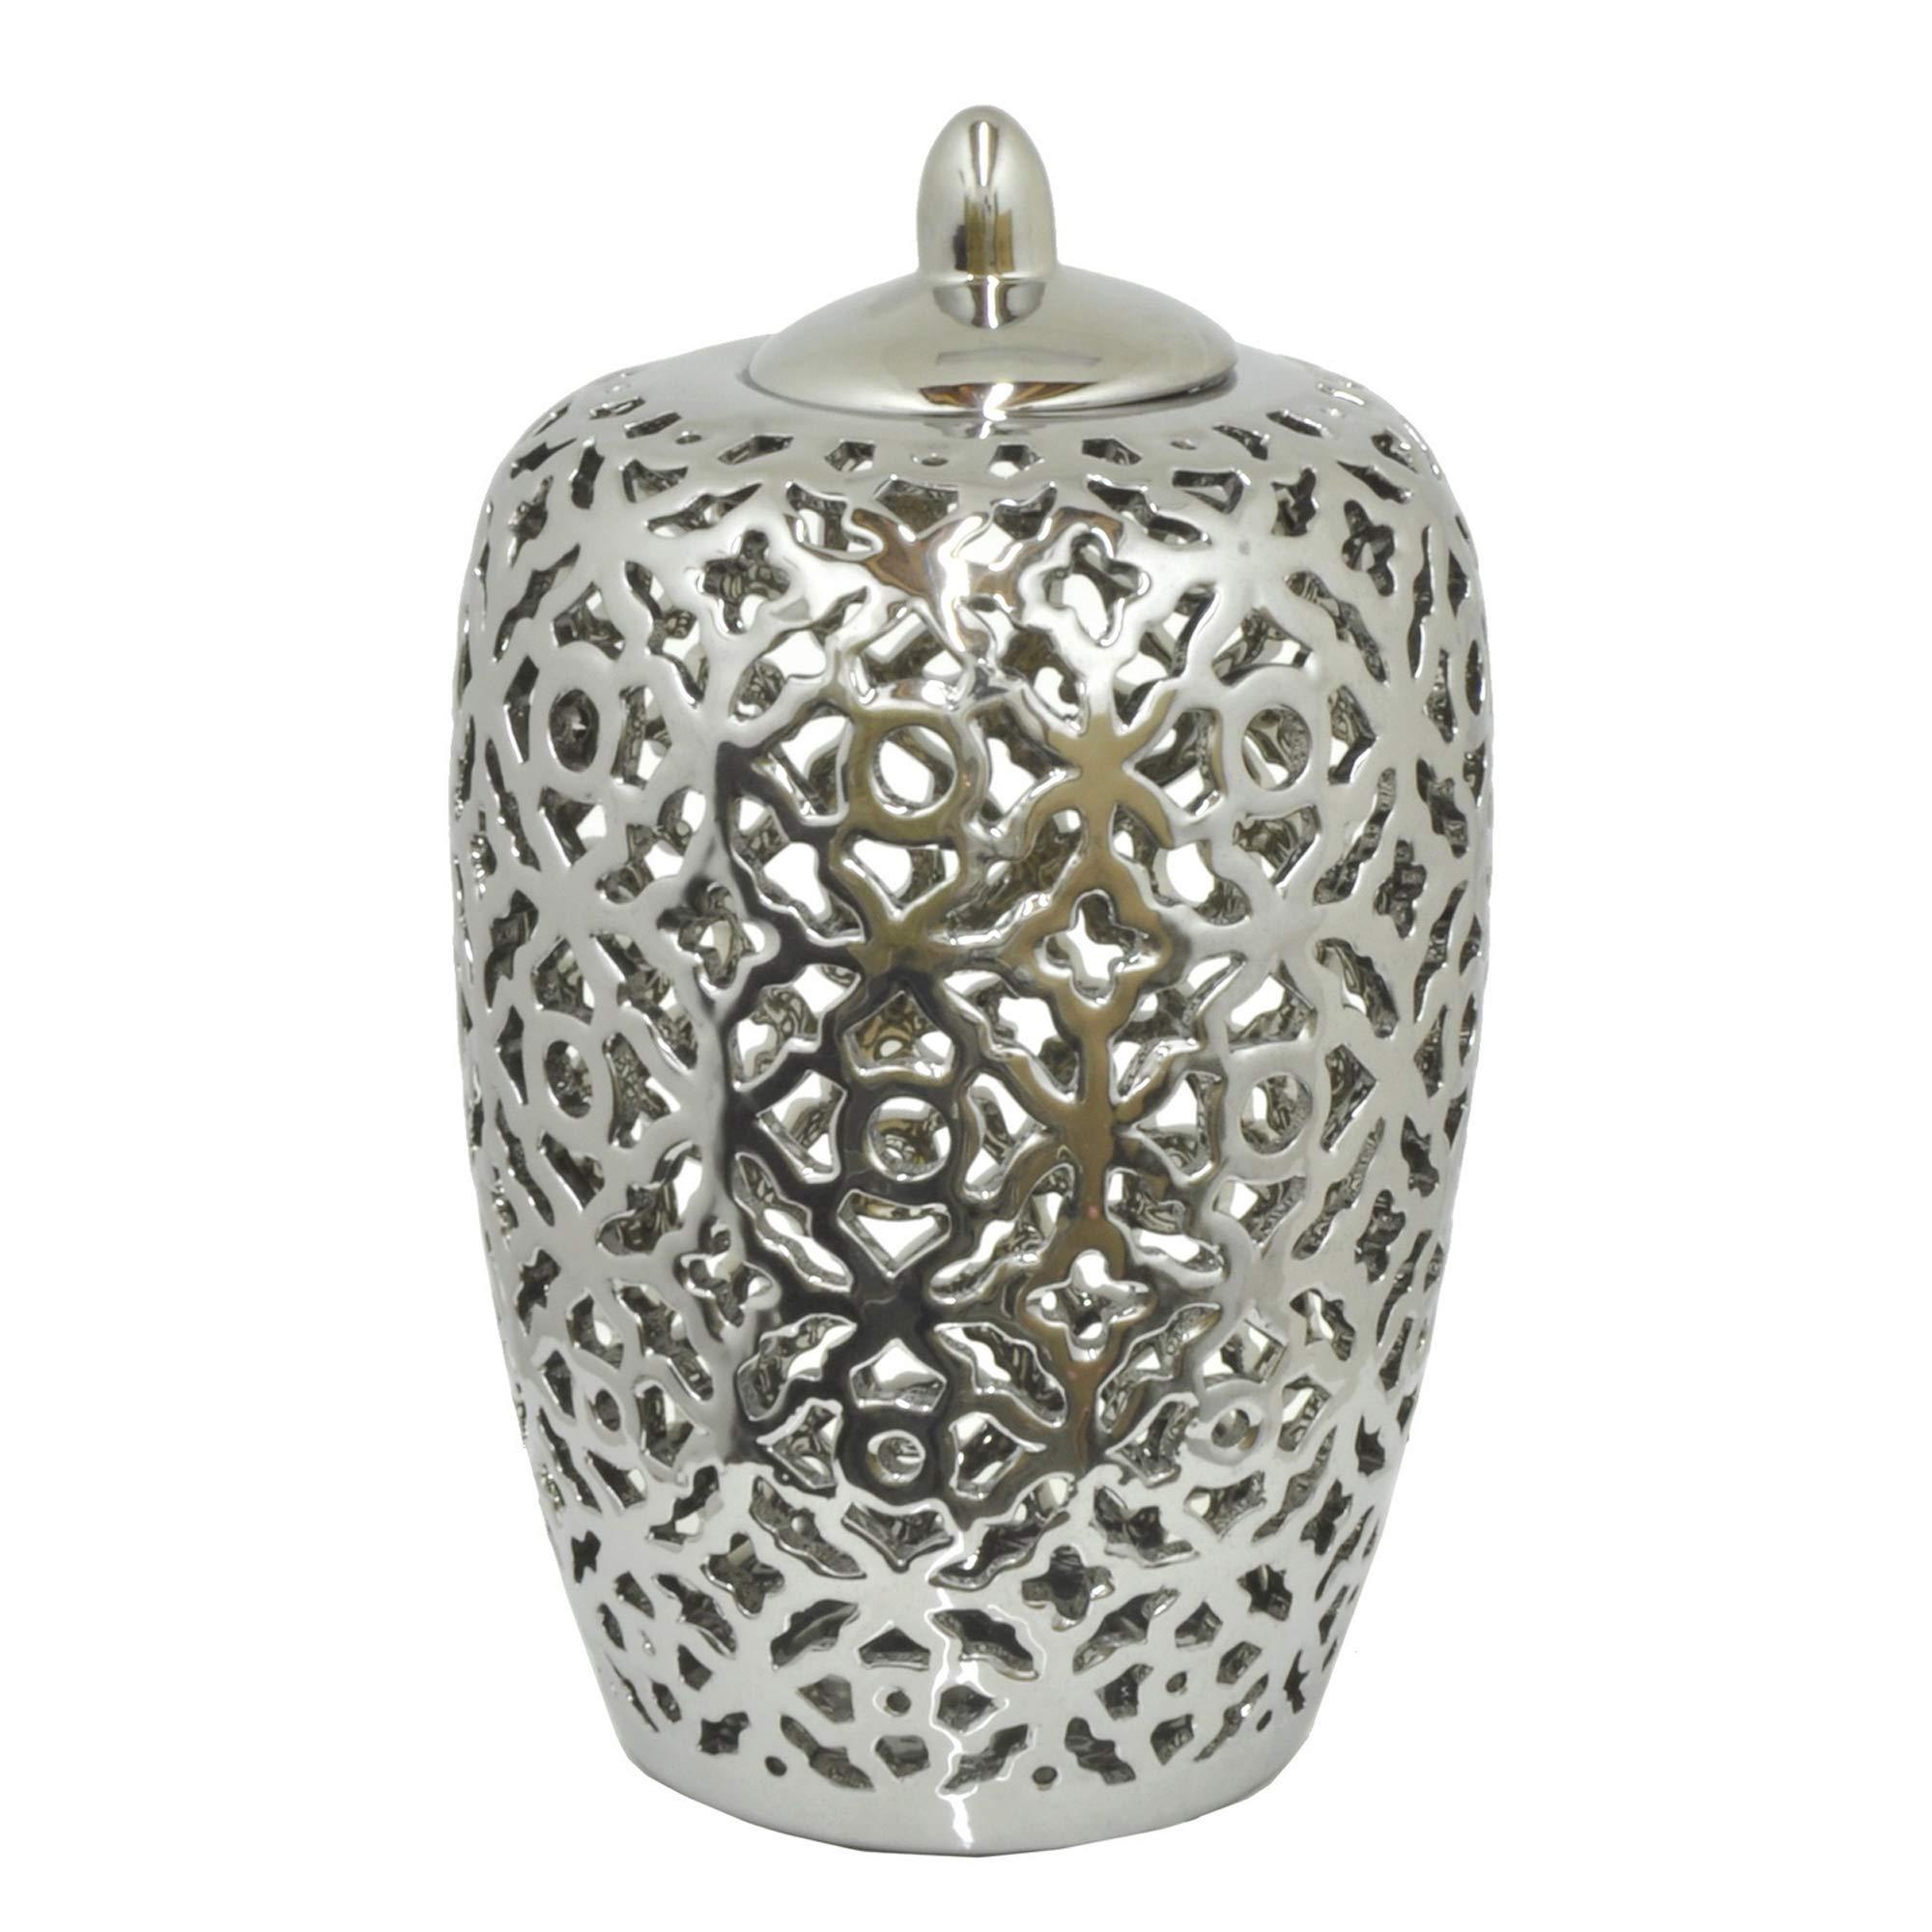 Three Hands 13'' Ceramic Pierced Jar - Silver in Silver